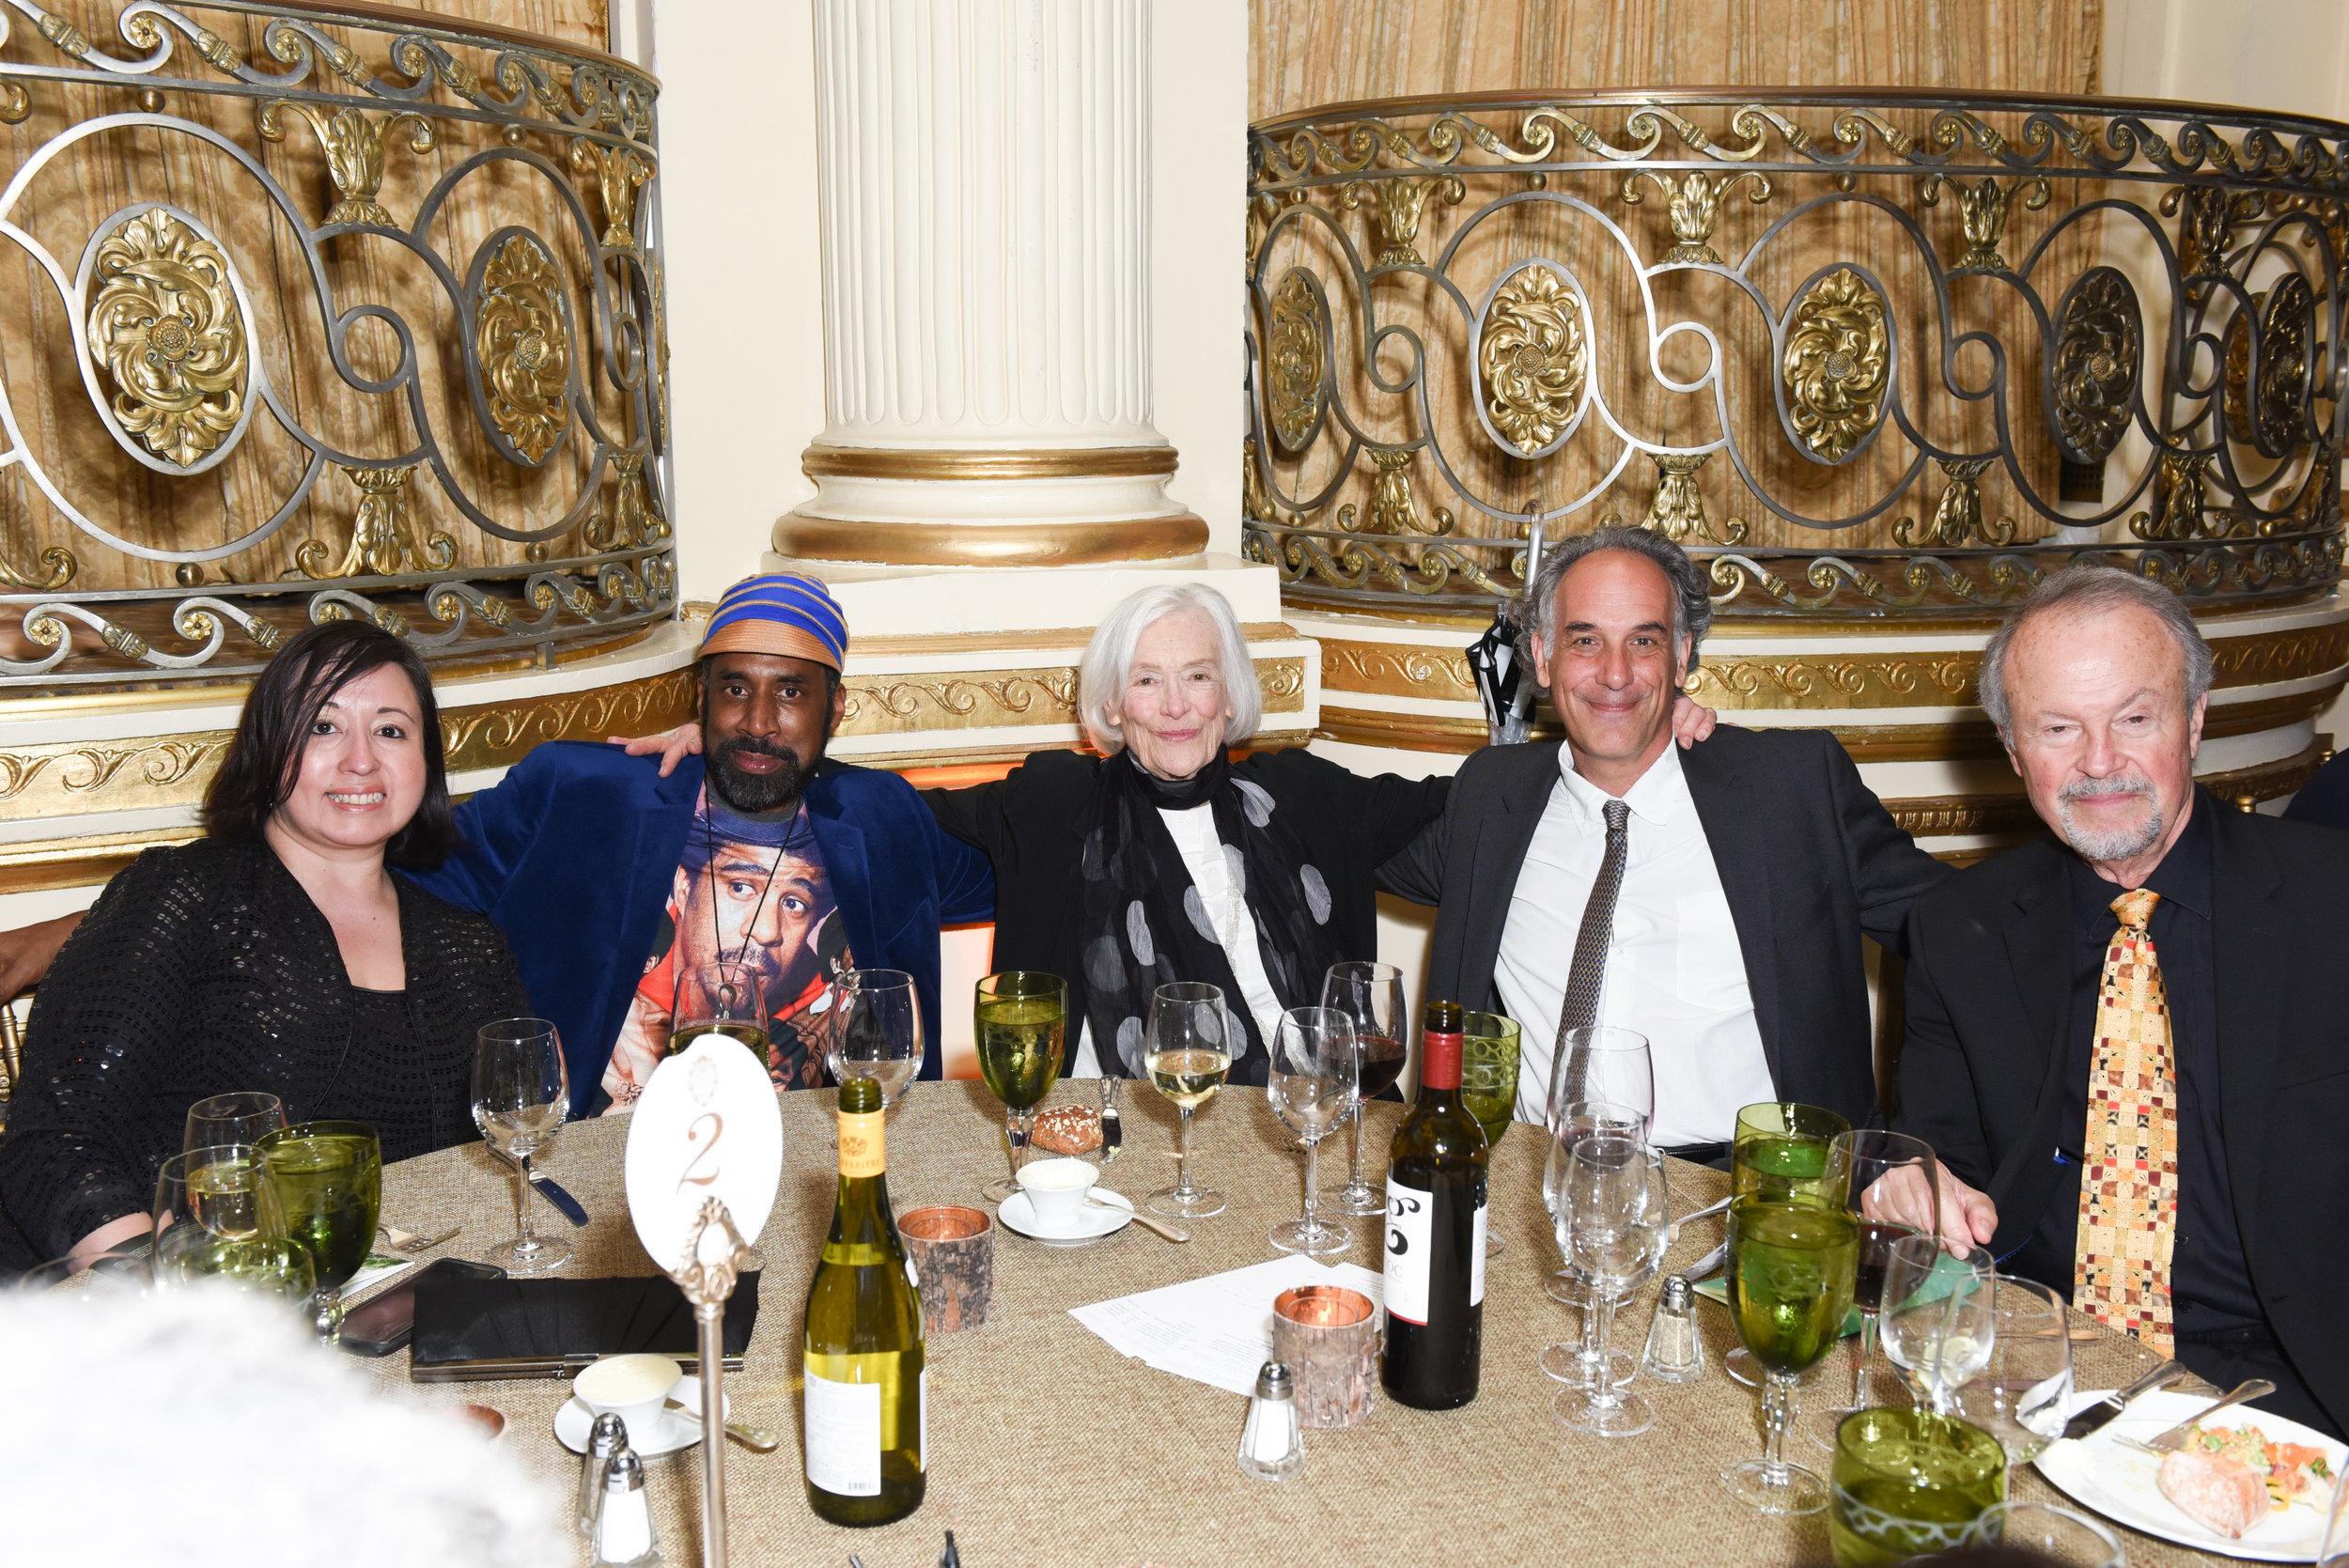 ?, ?, Barbara Lapcek, Jeffery Brown, Richard Lapchick==Skowhegan Awards Dinner 2018==The Plaza Hotel, New York, NY==April 24, 2018==�Patrick McMullan==Photo - Presley Ann/PMC====